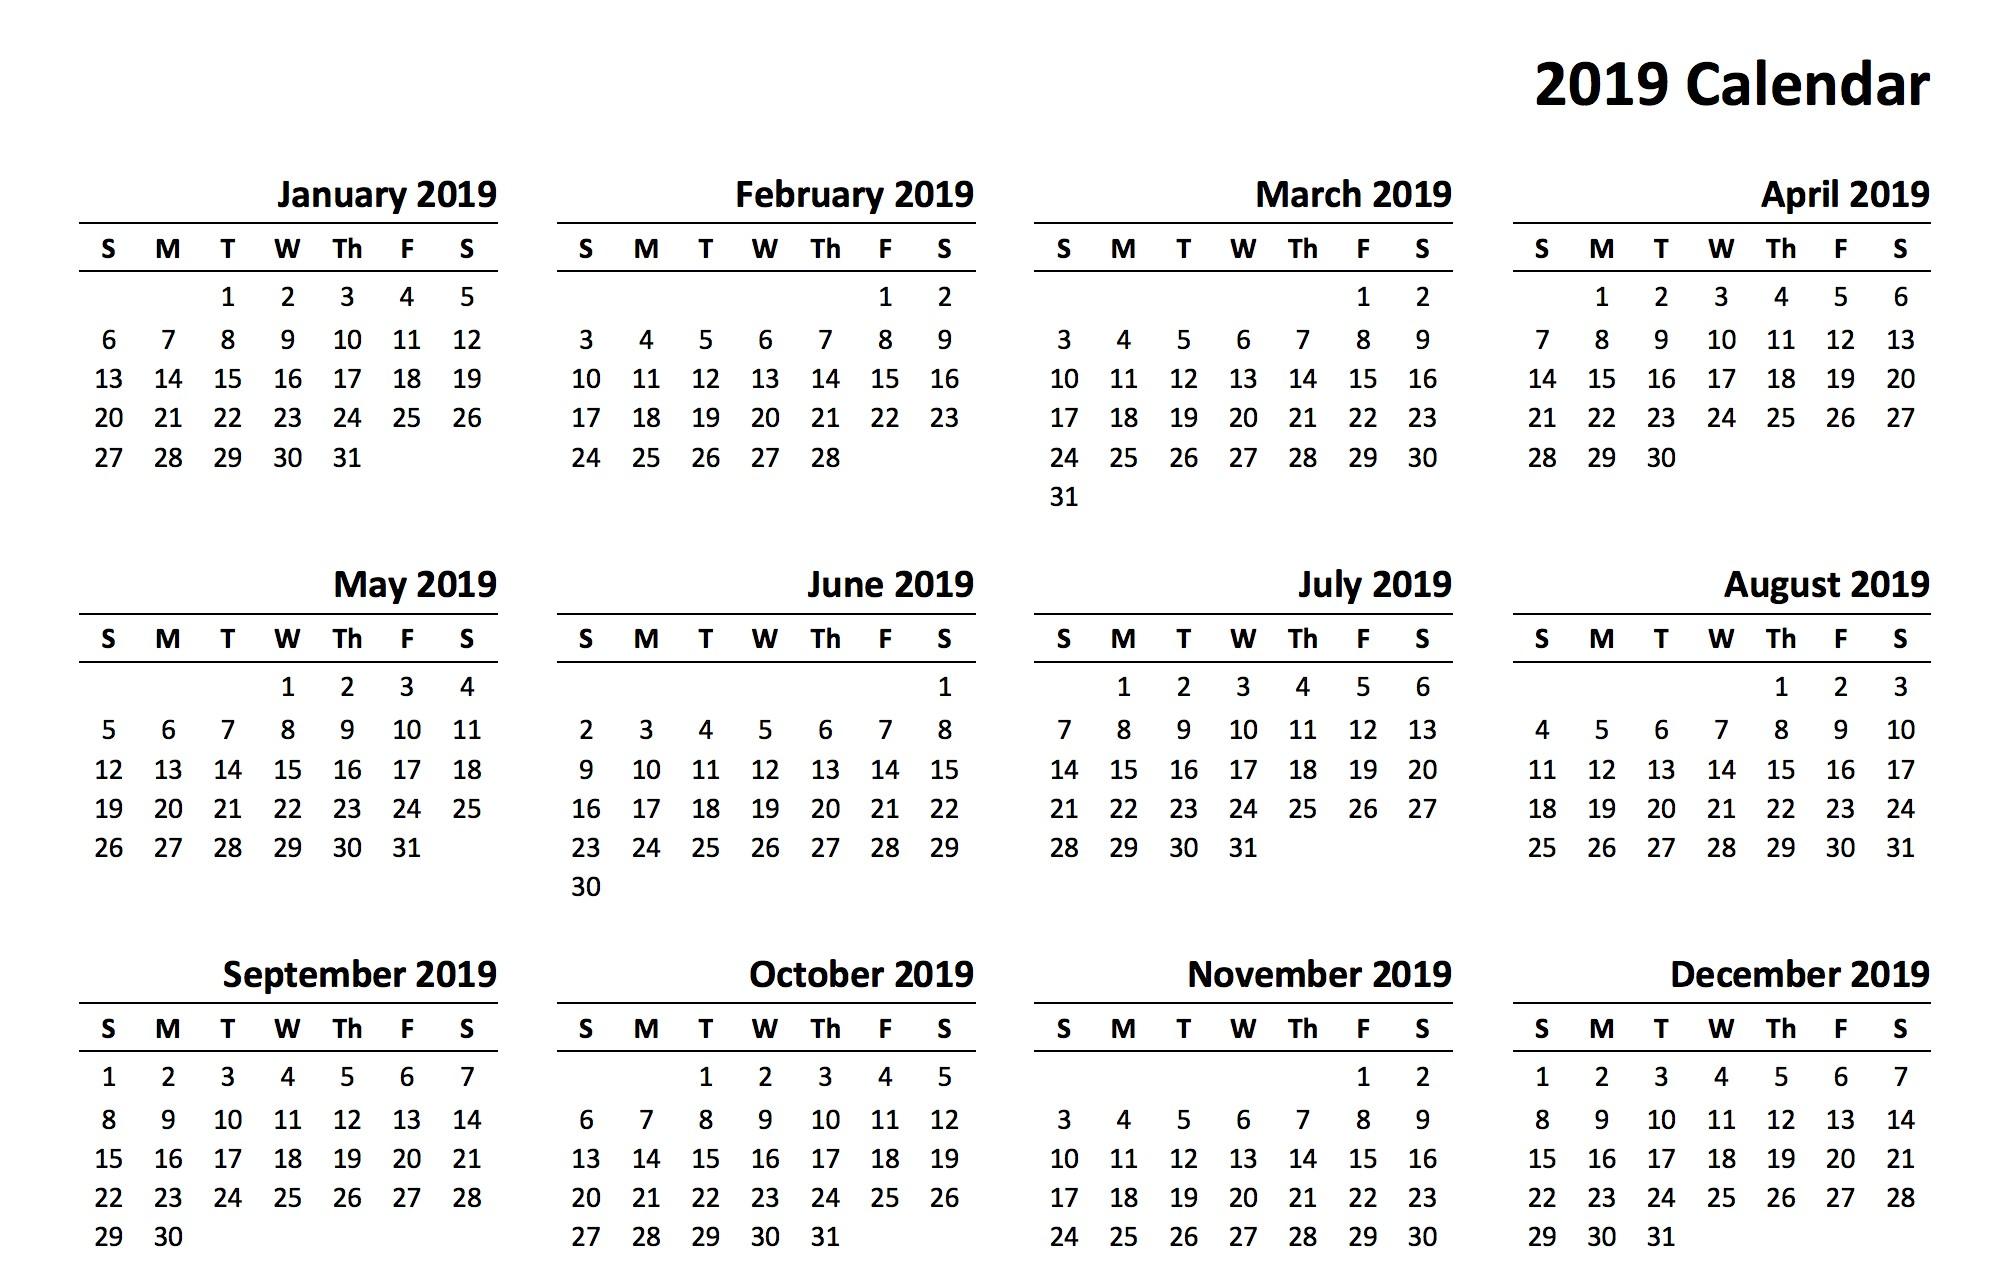 2019 Printable Calendar Template 2019 Calendar Amazonaws